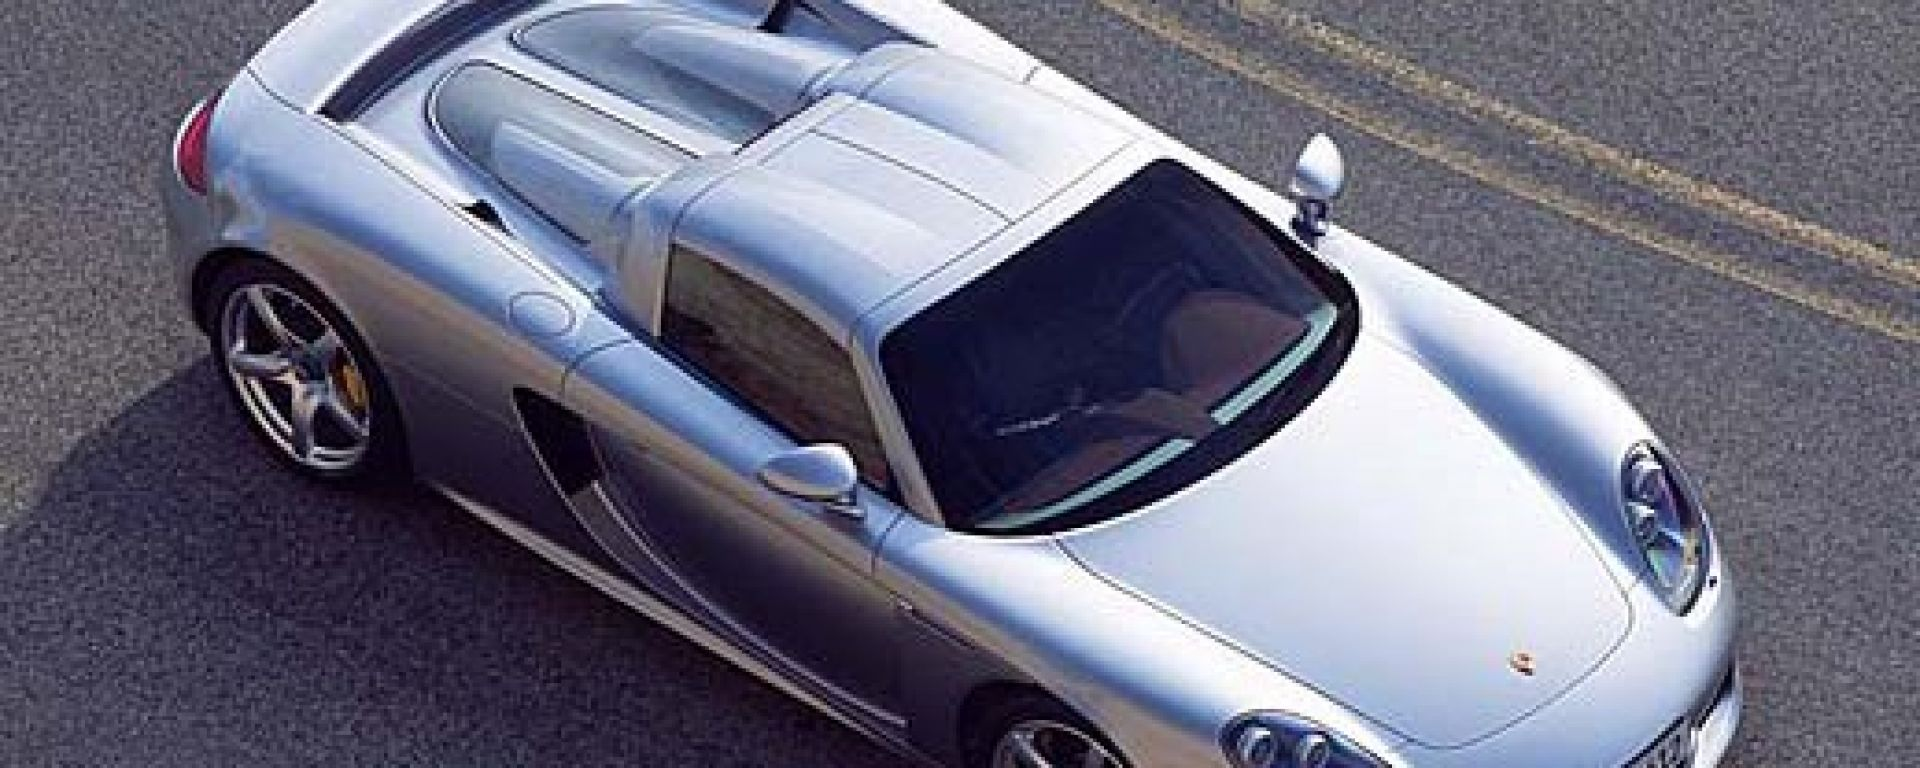 Anteprima: Porsche Carrera GT